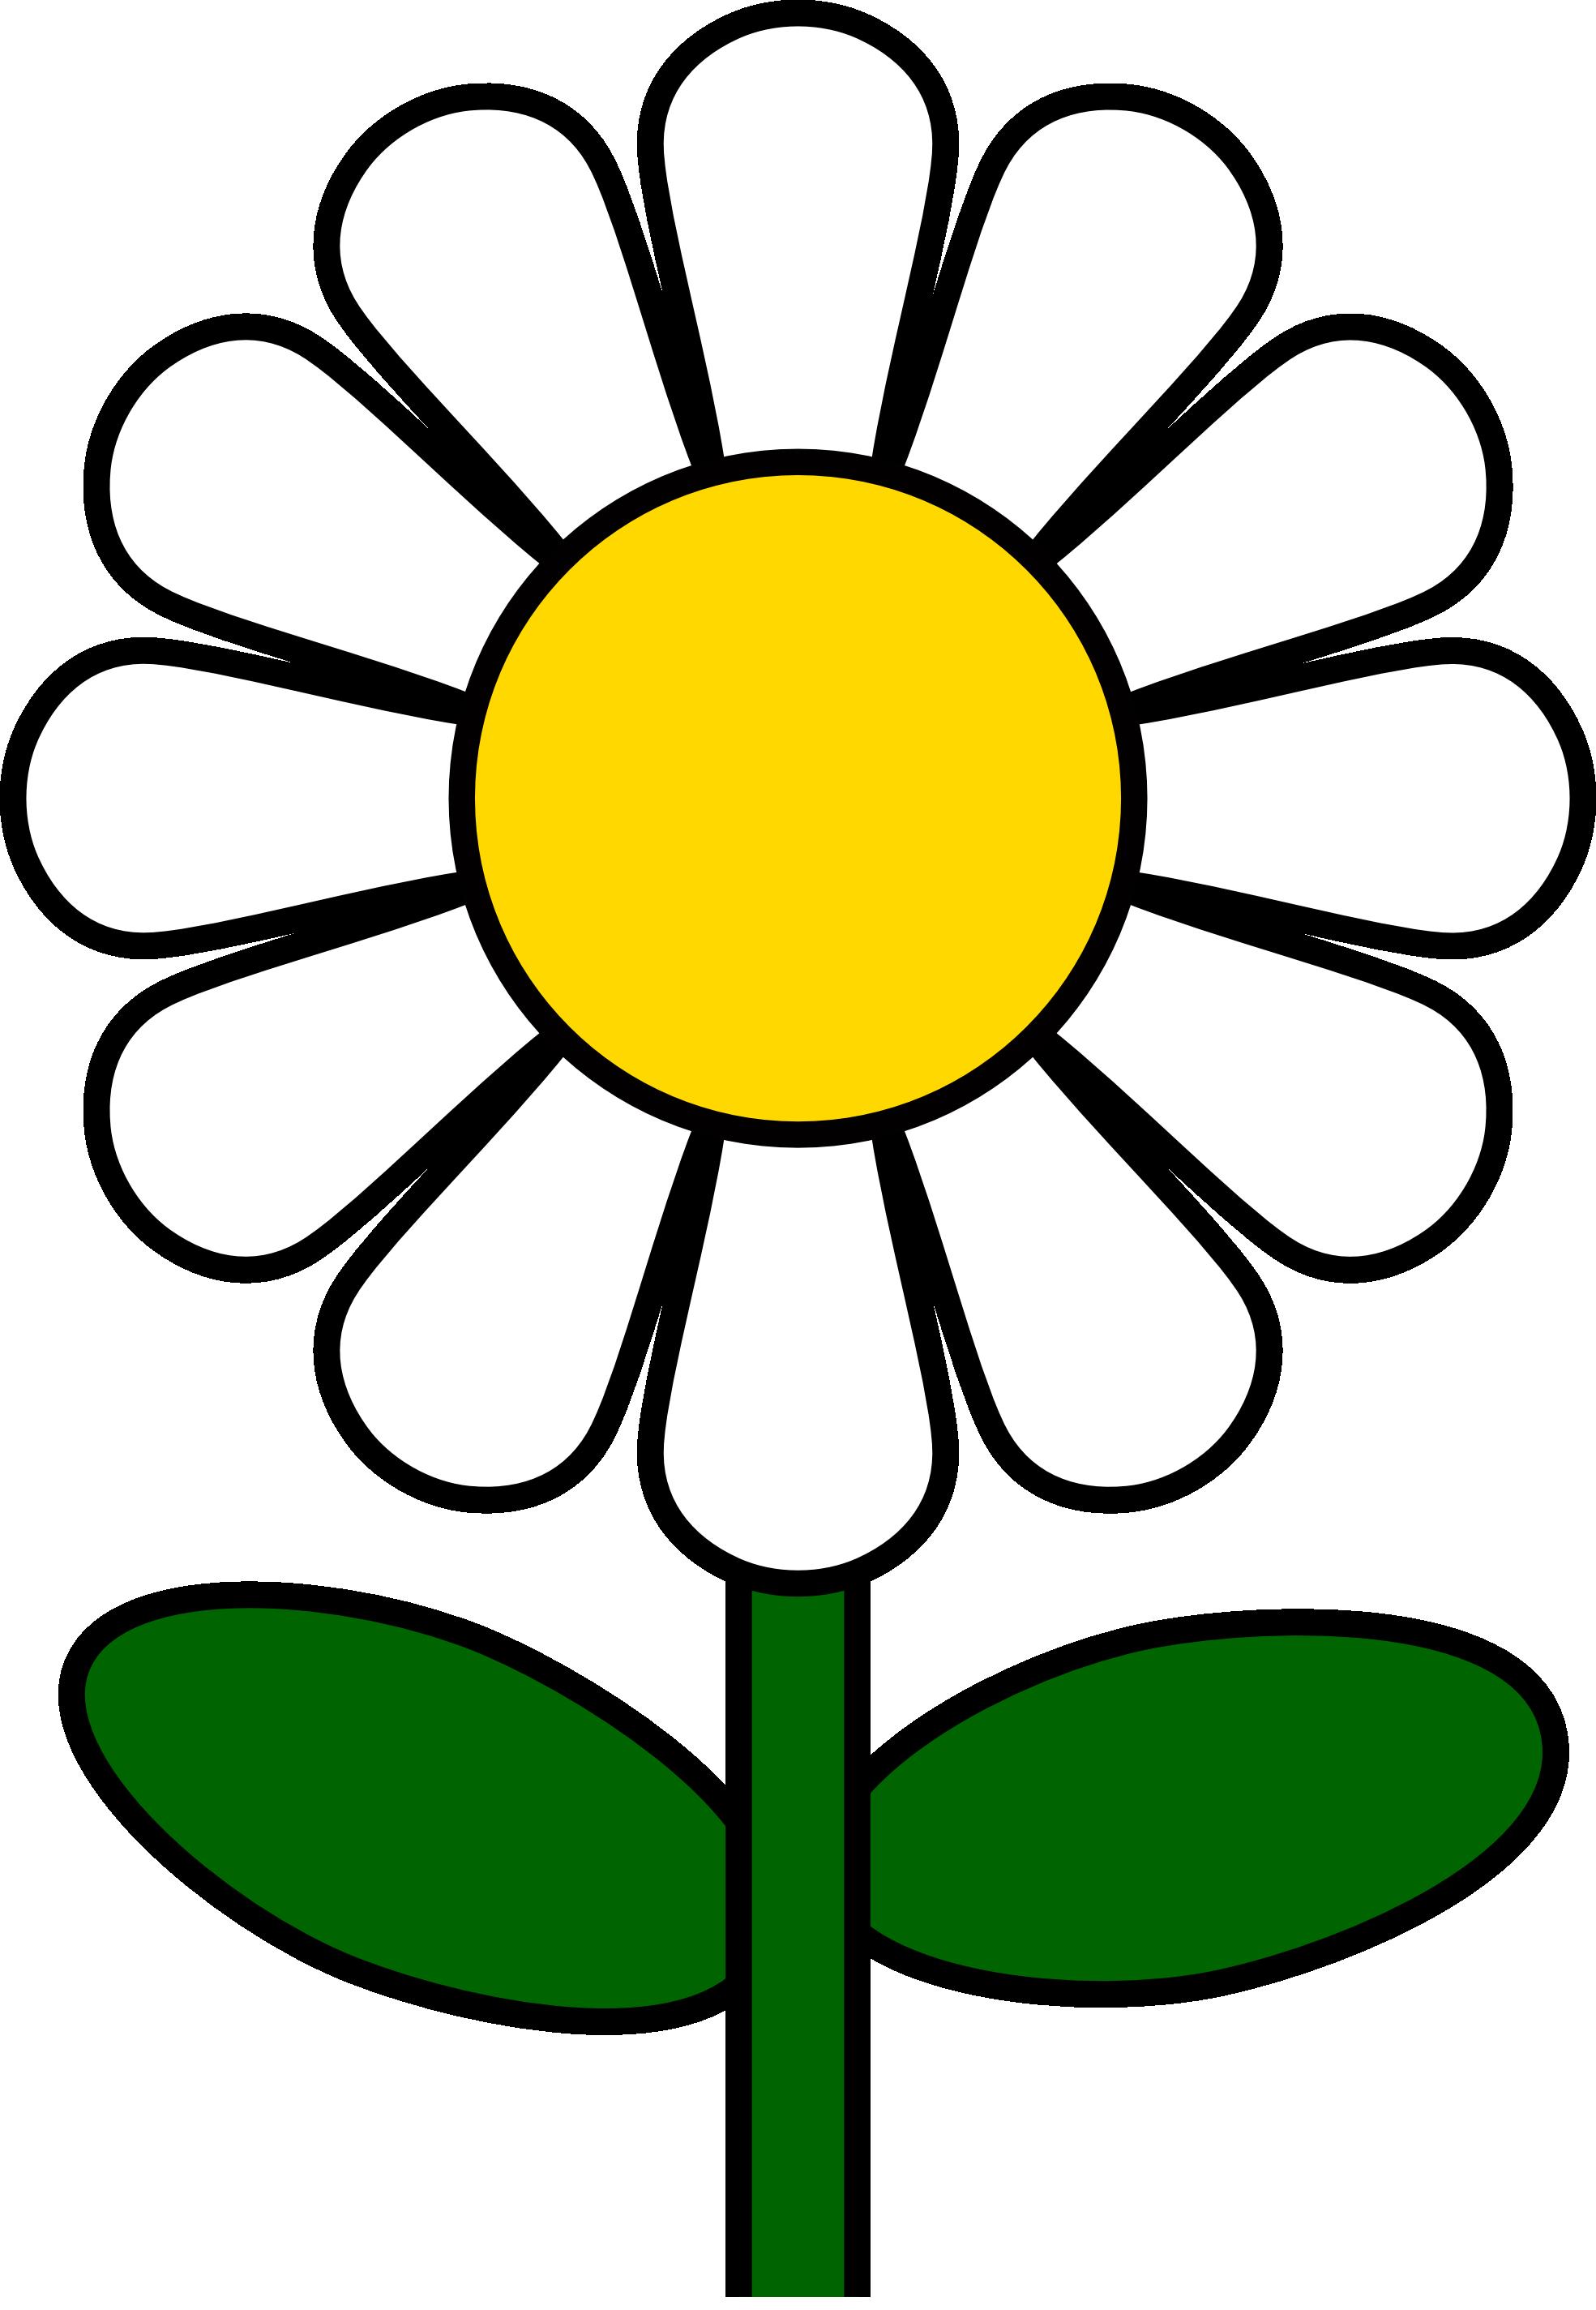 Flower clipart daisy, Flower daisy Transparent FREE for.